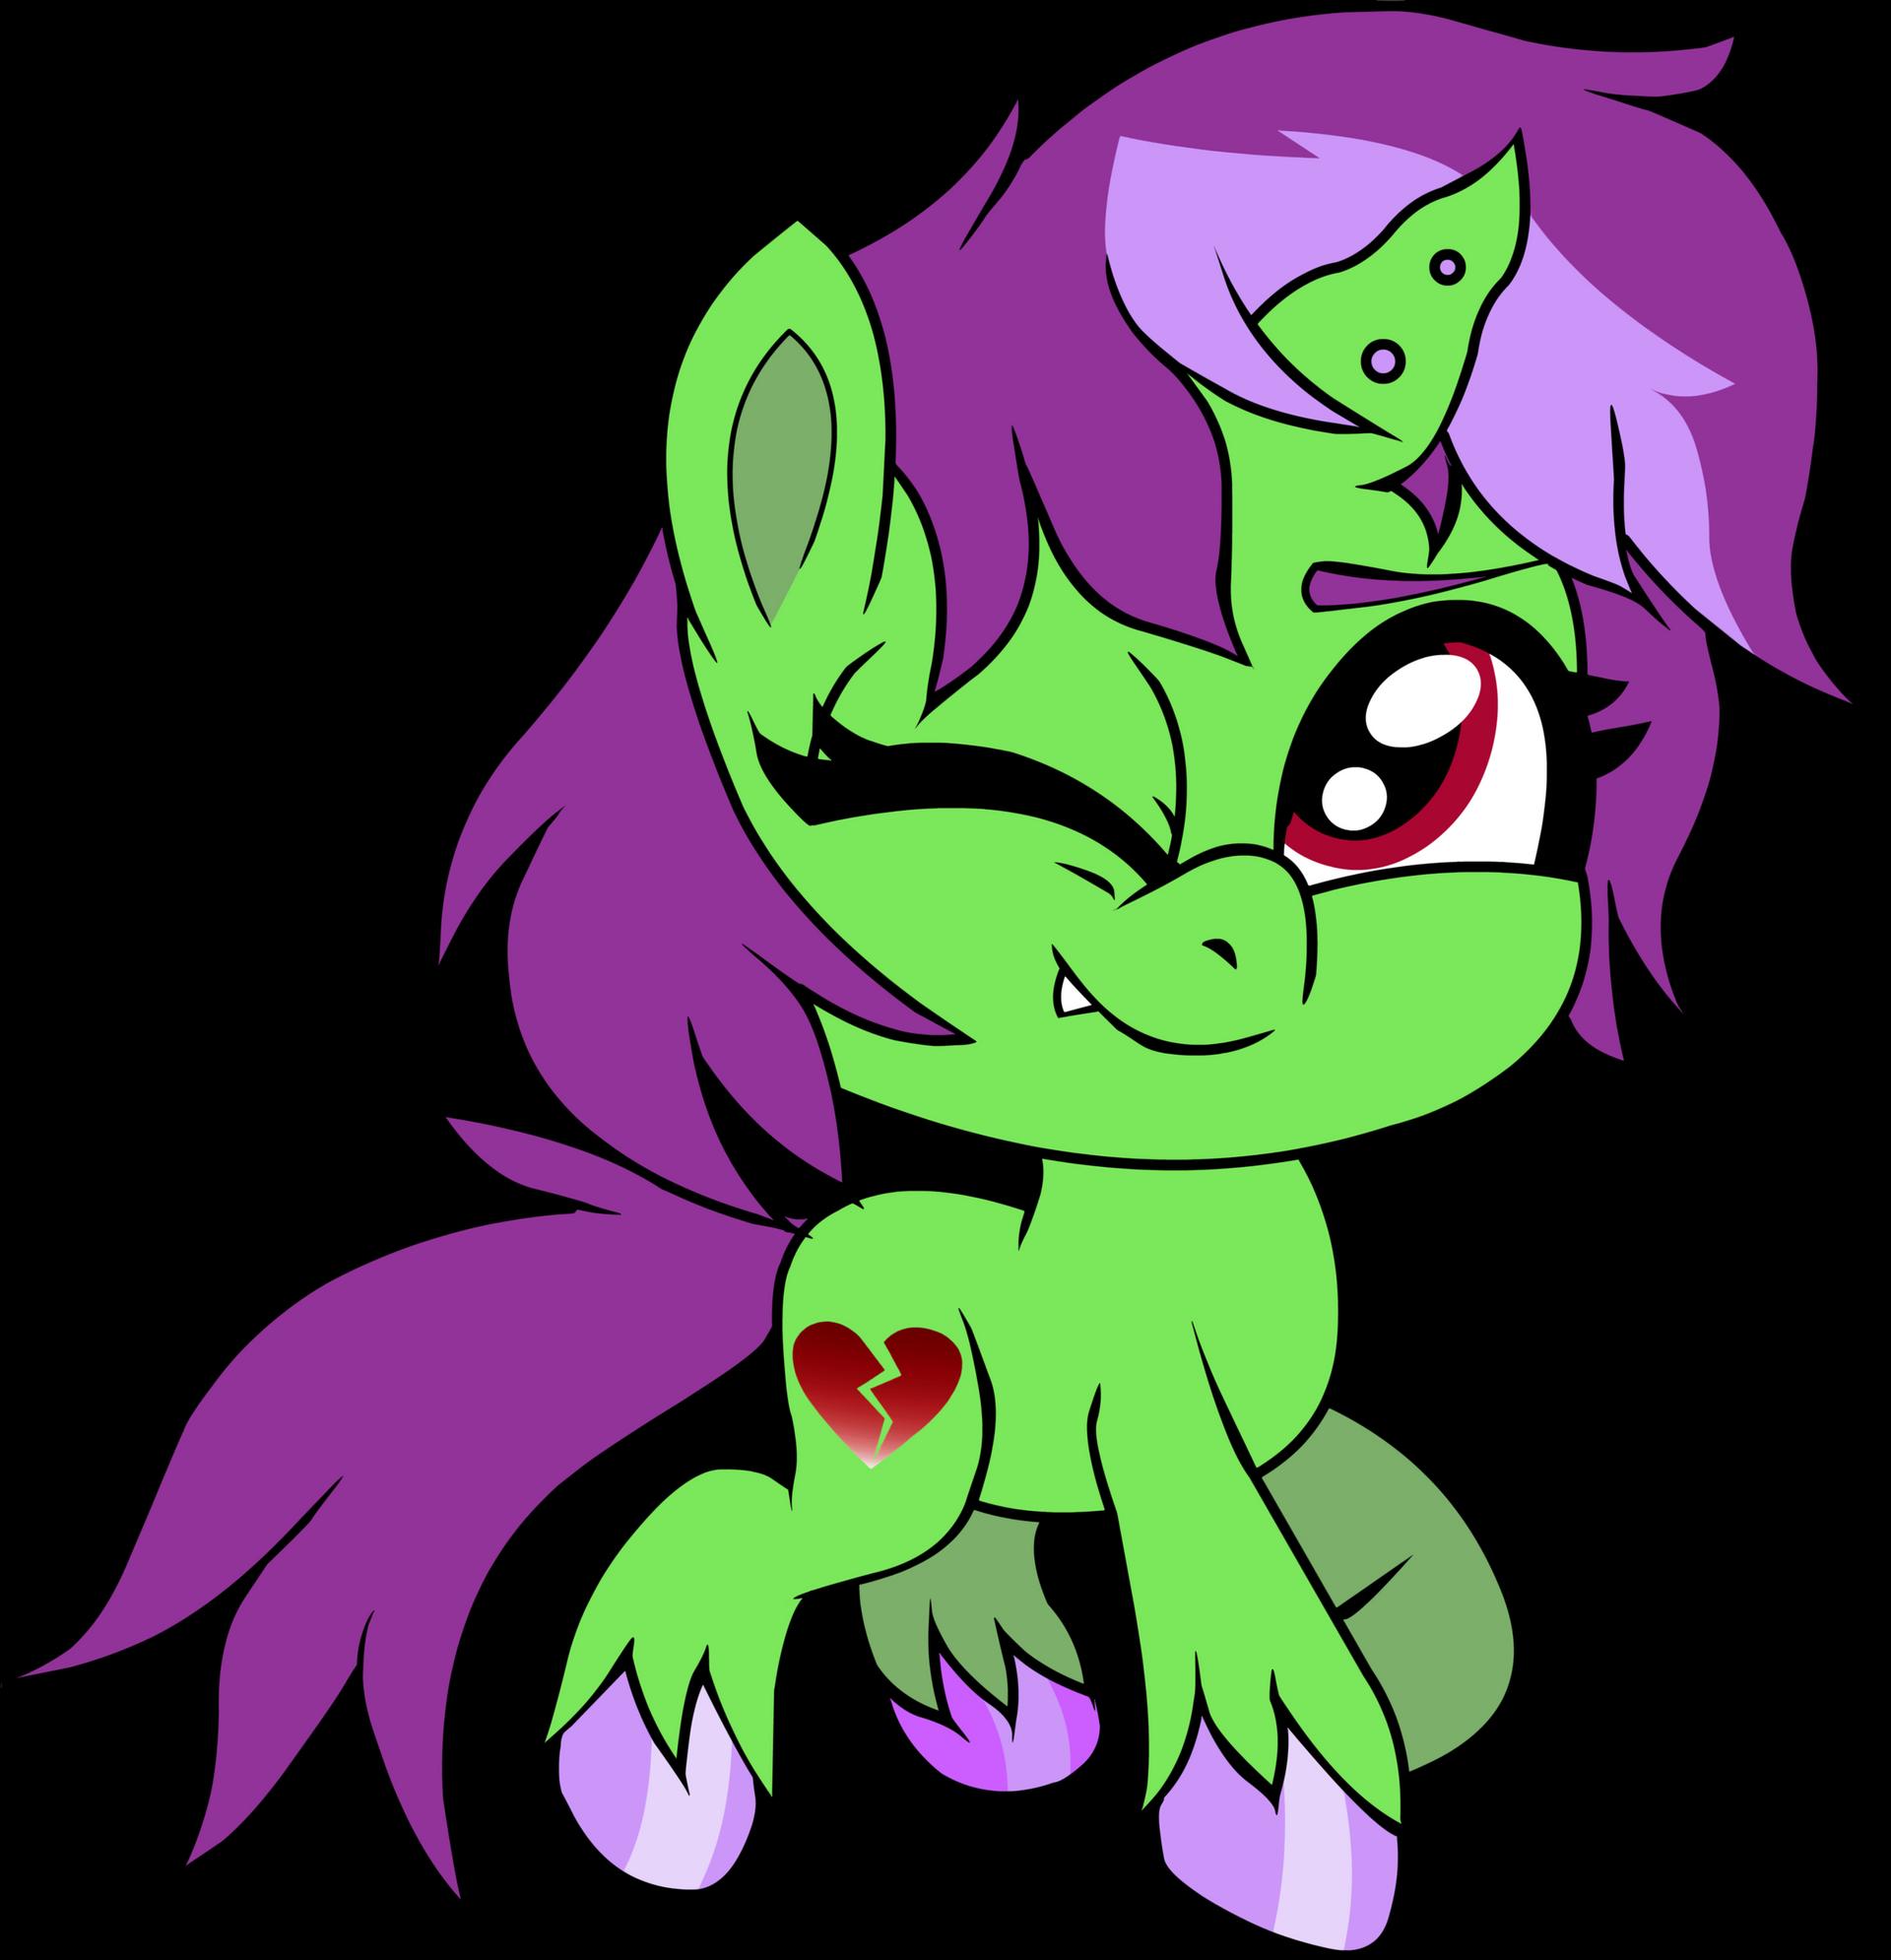 pony_life_cryptic_by_fyre_flies_ddzap94-